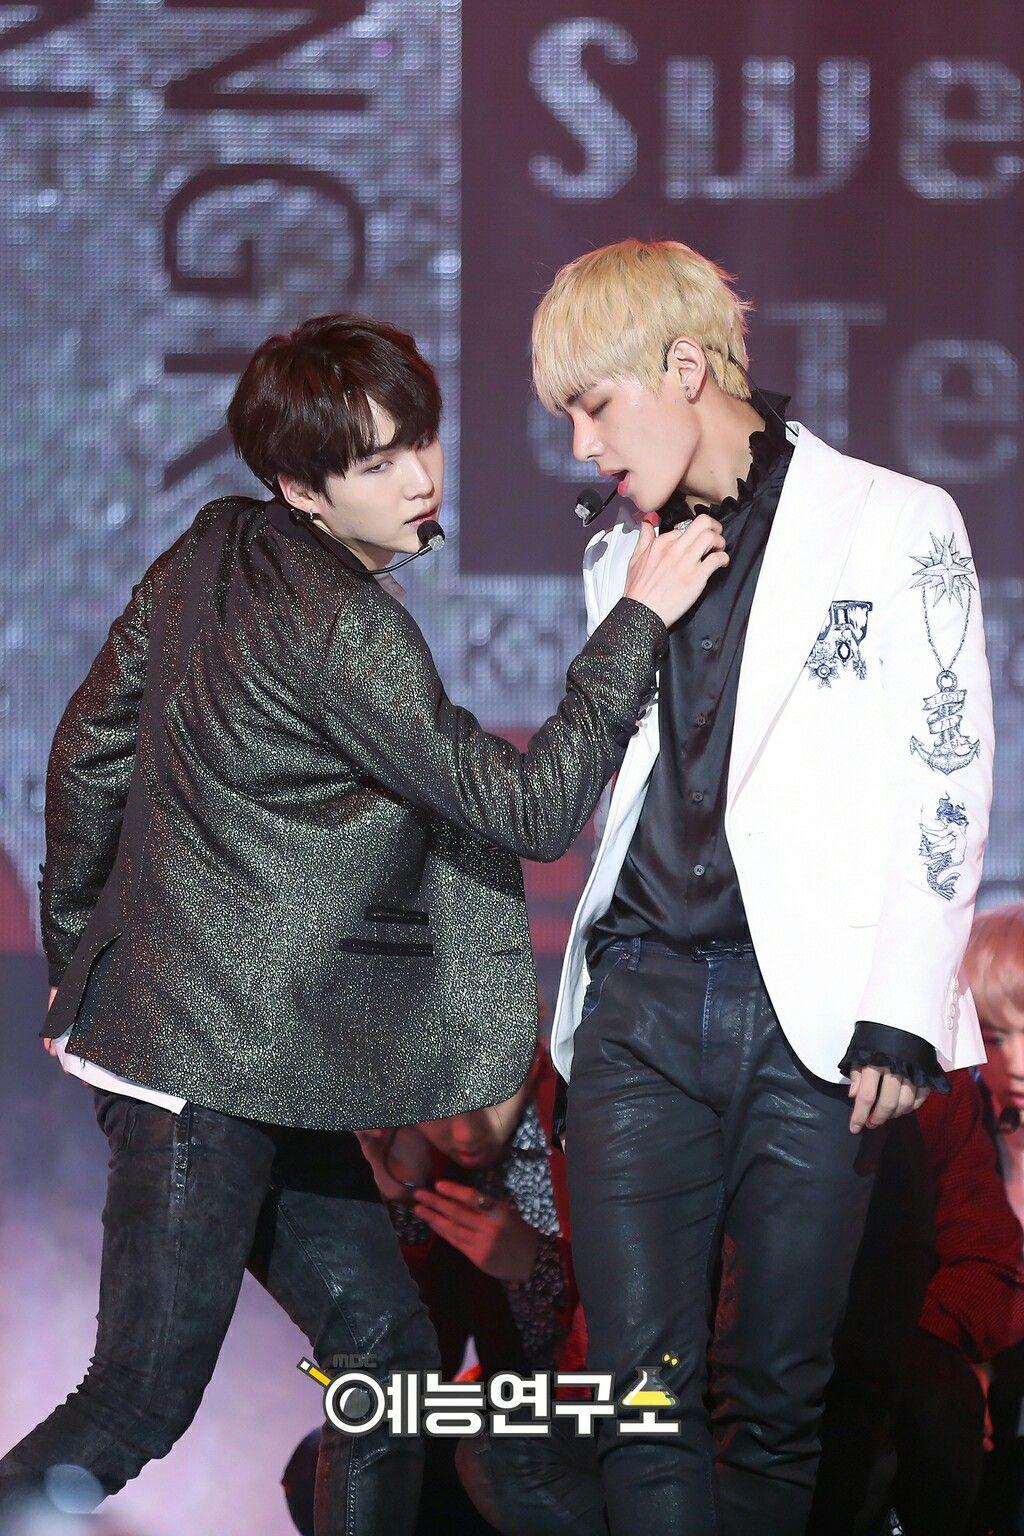 161029 Blood Sweat Tears Live Taegi Bts Yoongi Bts Boys